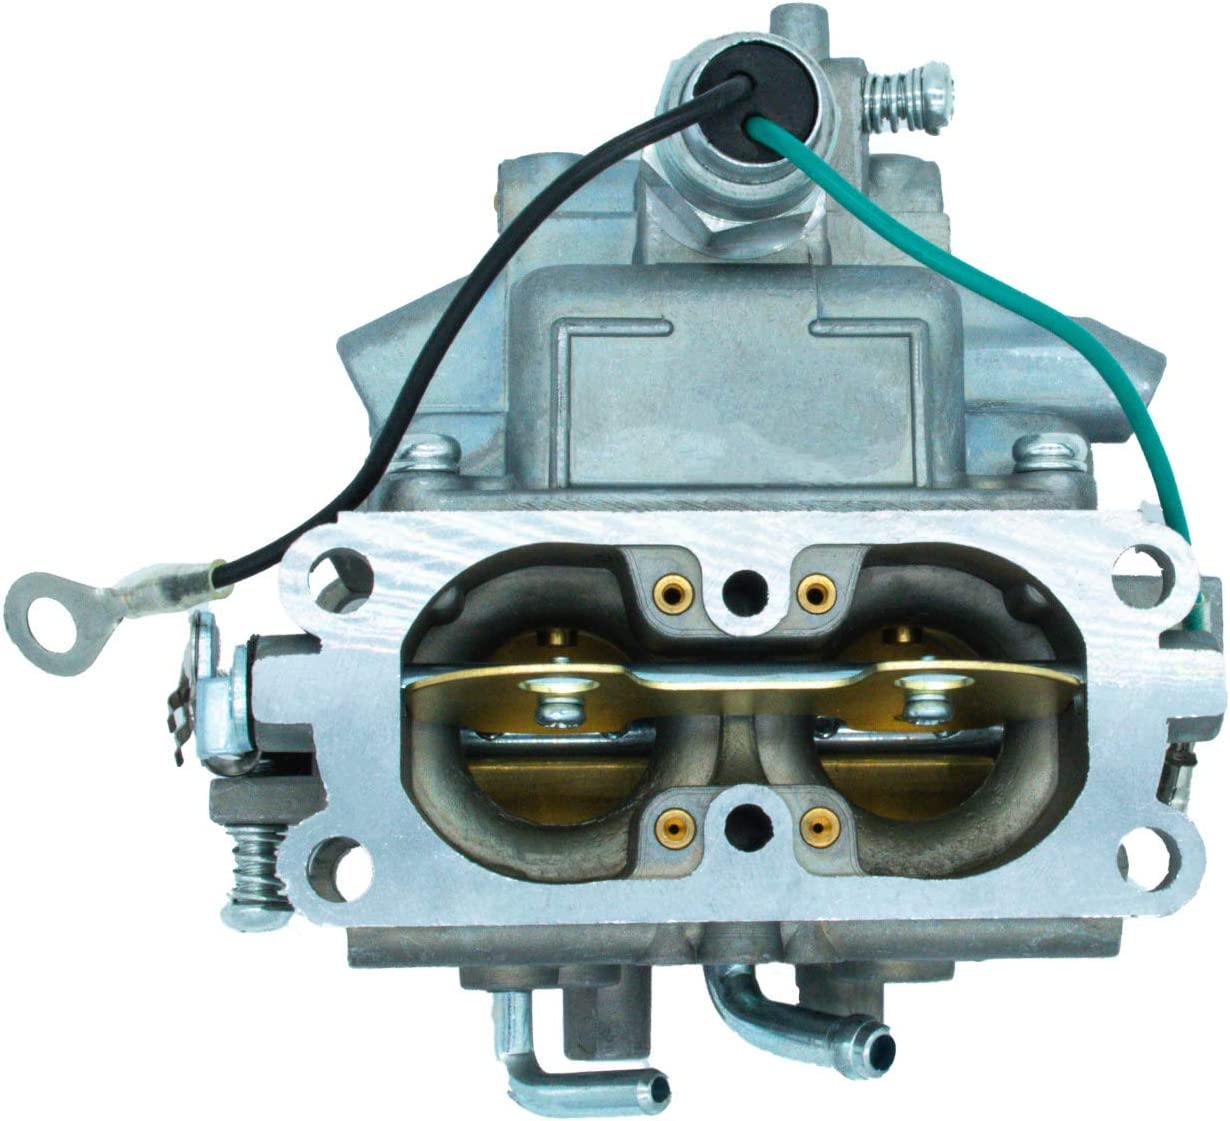 INSOMOV Carburetor Replacement Part for Kawasaki 15003-7079 Carburetor 15003-7045, Fits FH680V